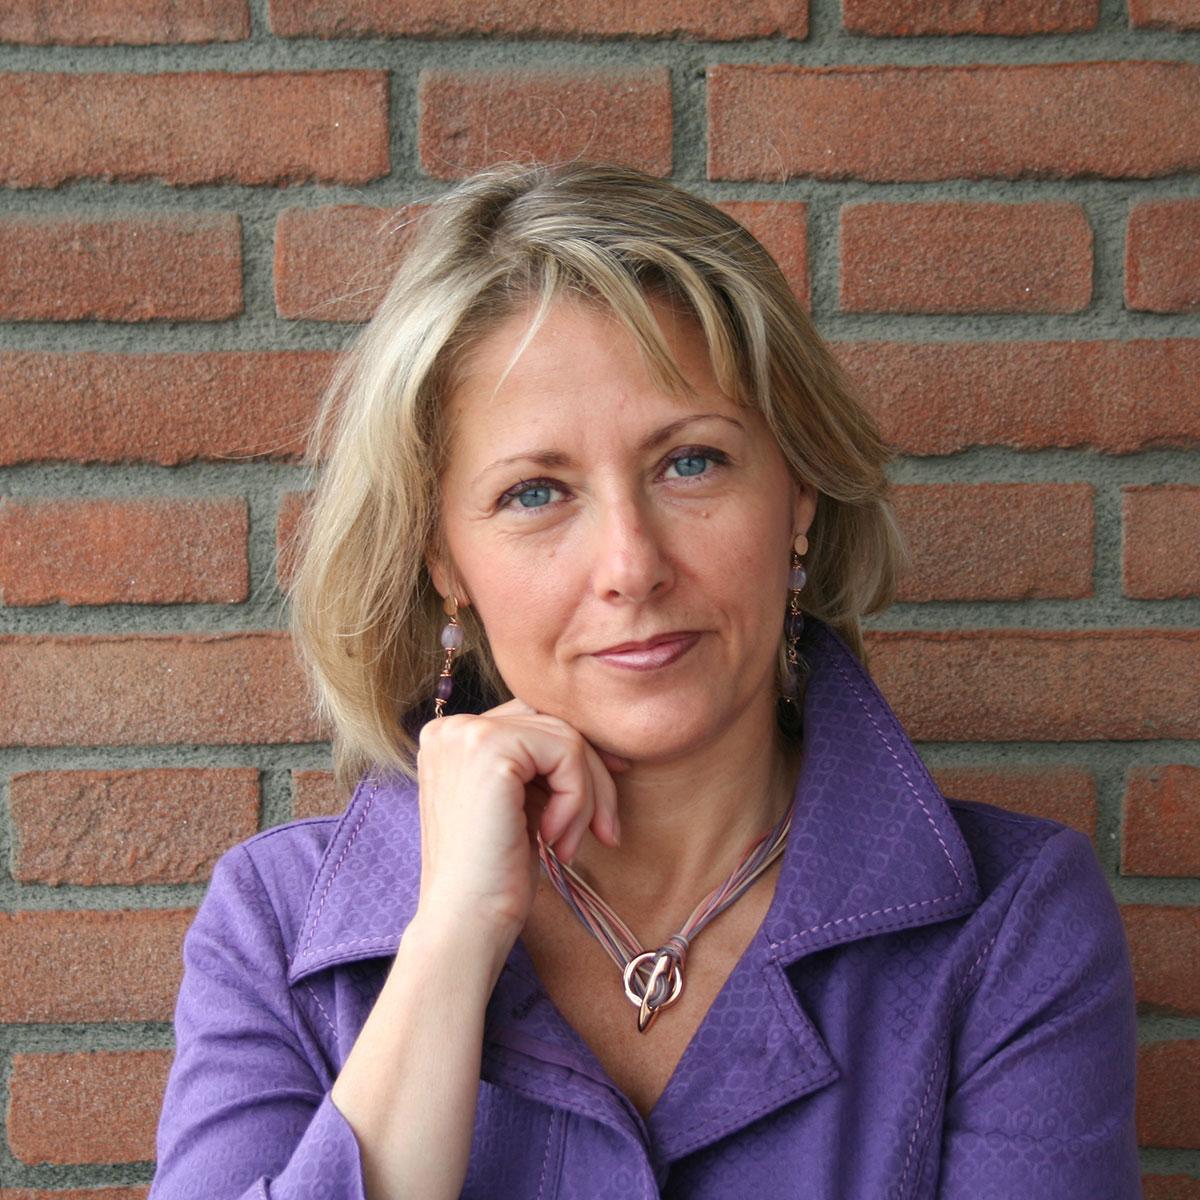 Susanna Fanelli